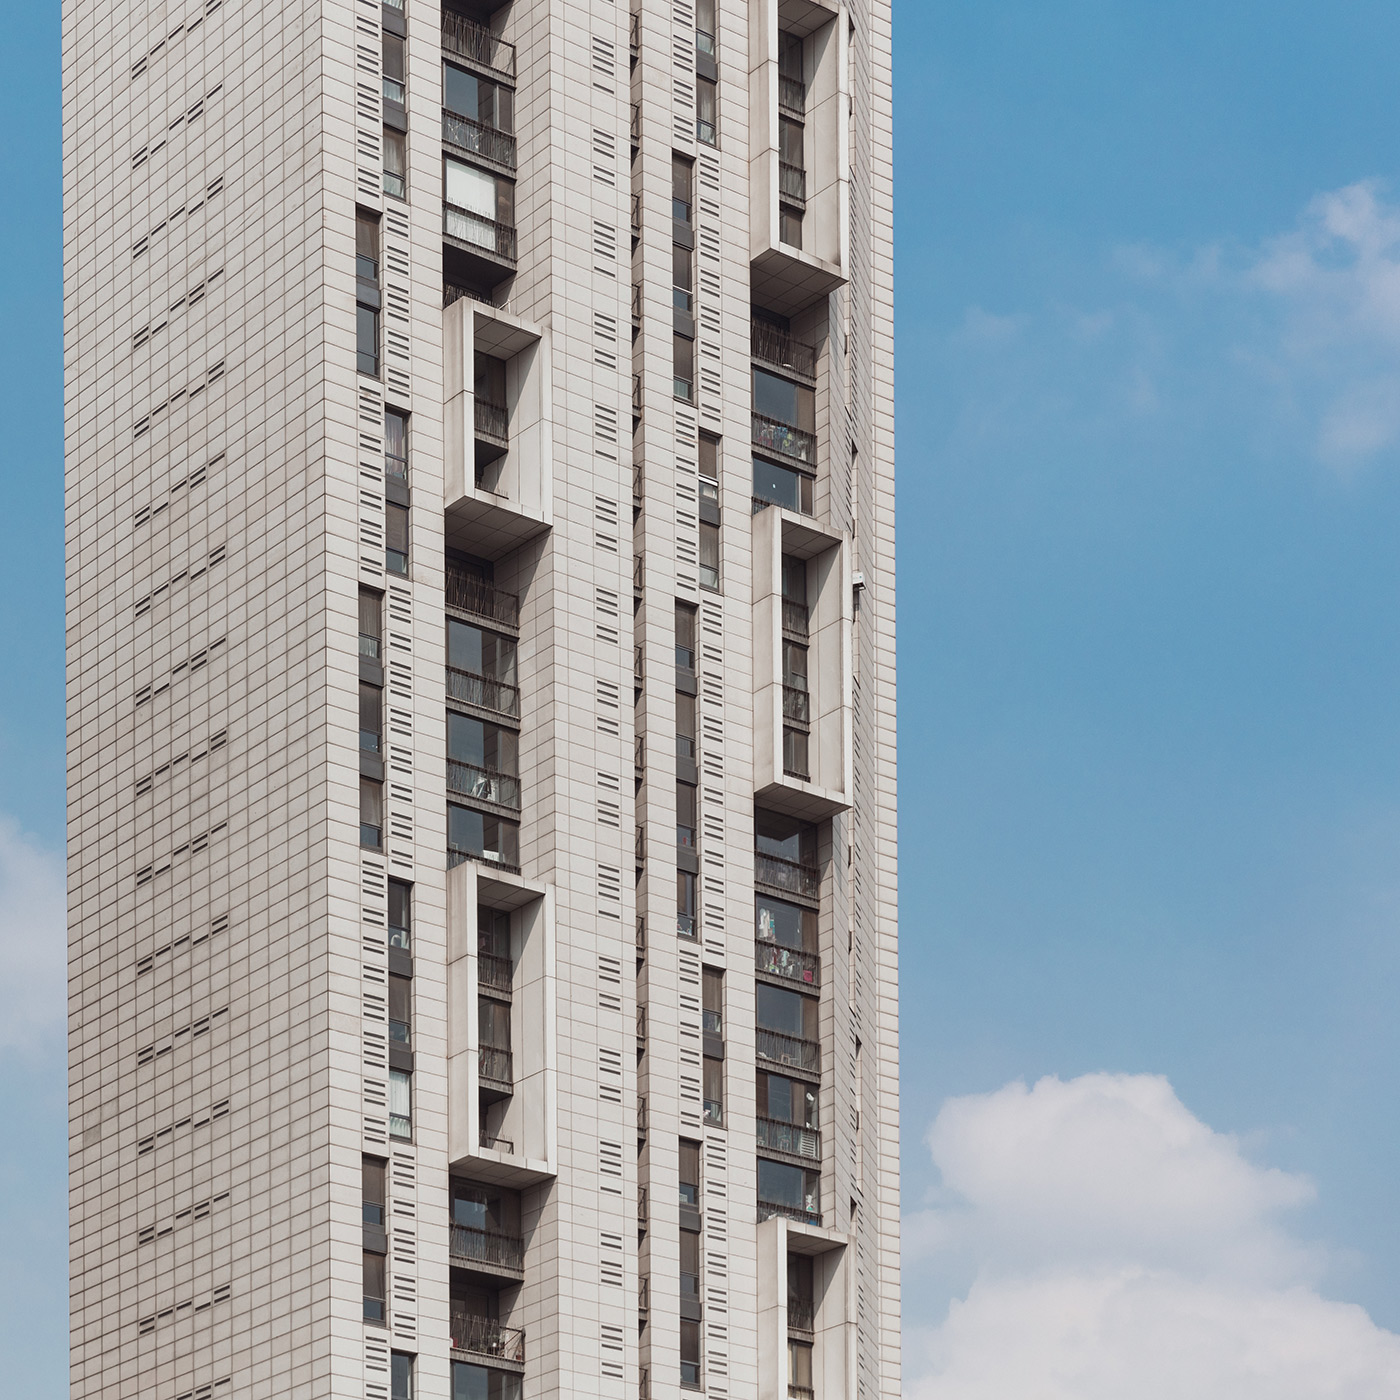 Andersen garden Housing Complex . Location: Beijing, China . Architect: schmidt hammer lassen architects